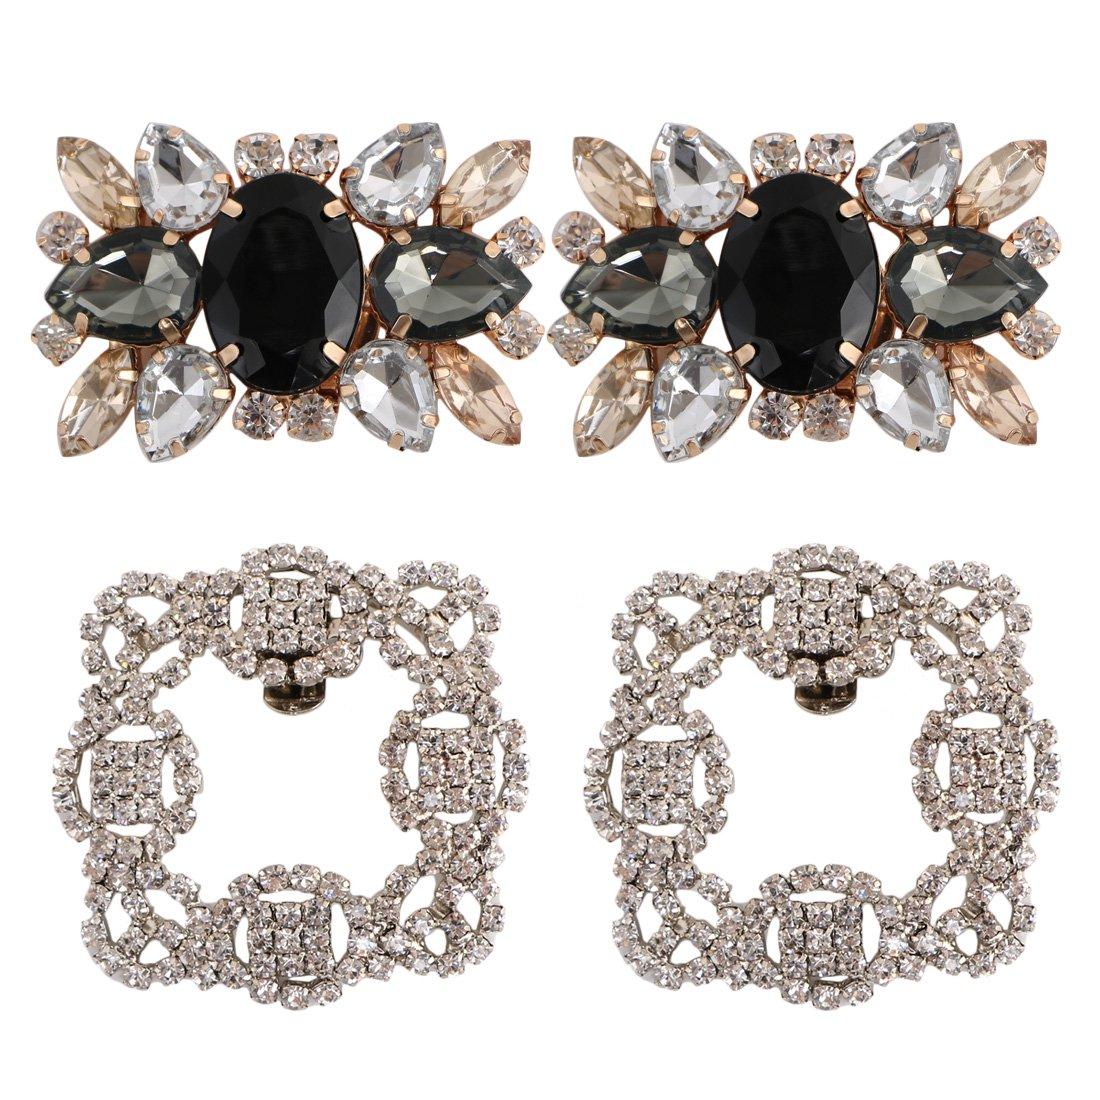 kilofly 2 Pairs Elegant Rhinestone Crystal Metal Shoe Clips Wedding Party Pack